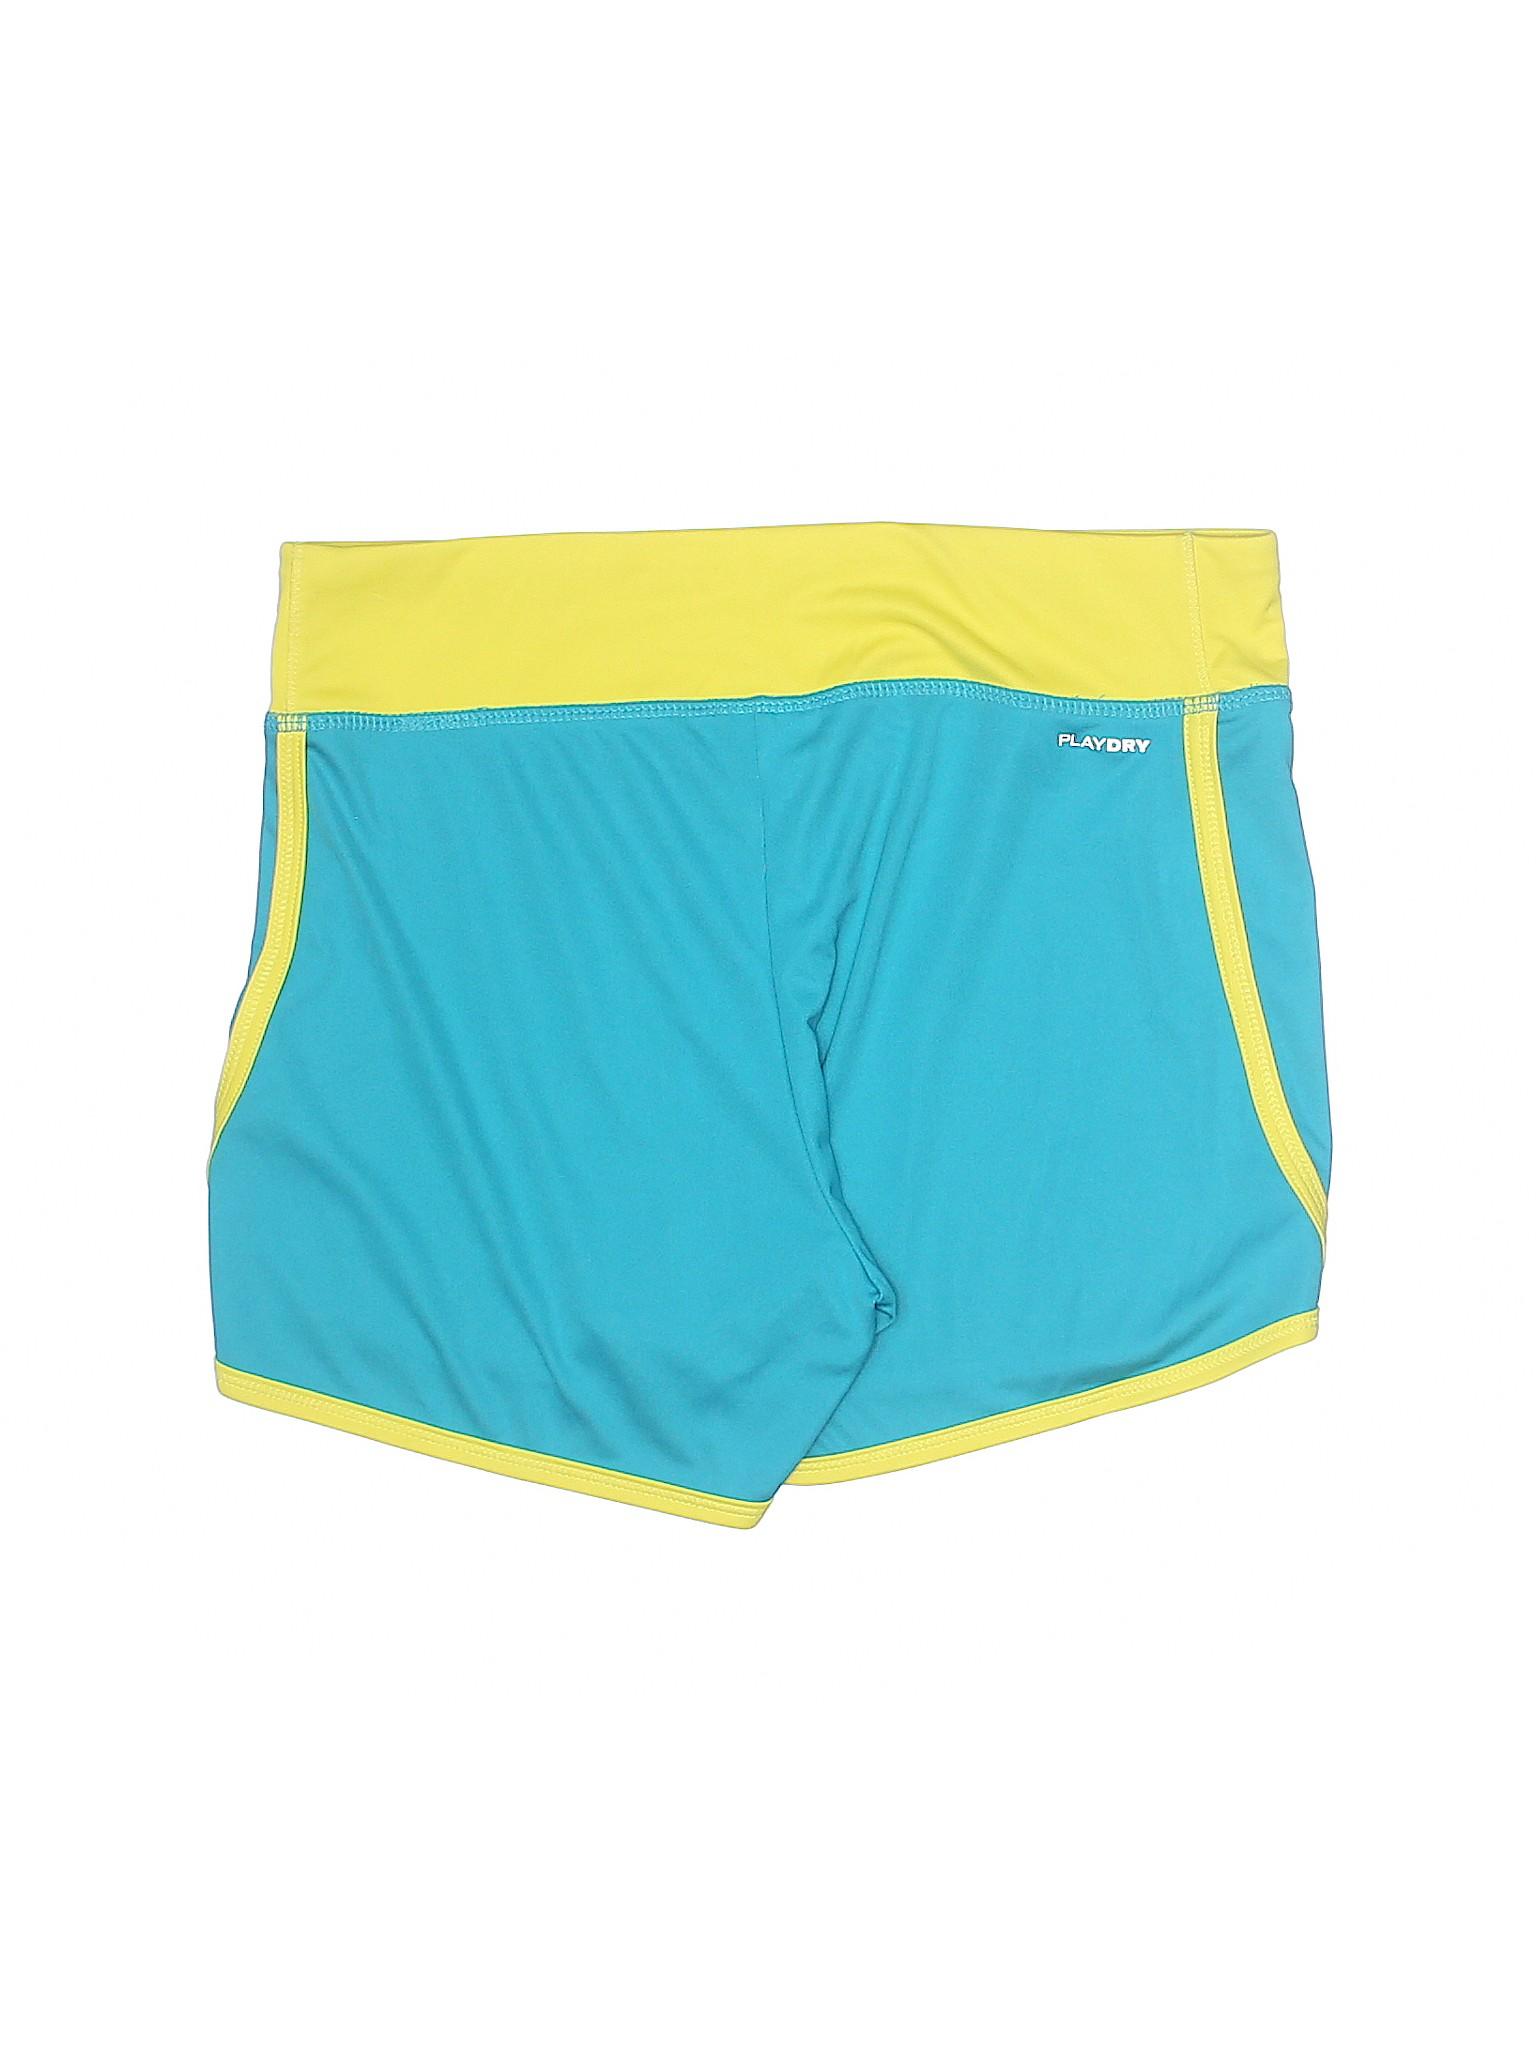 Shorts Athletic Boutique Reebok Boutique Reebok Athletic 17qSSF